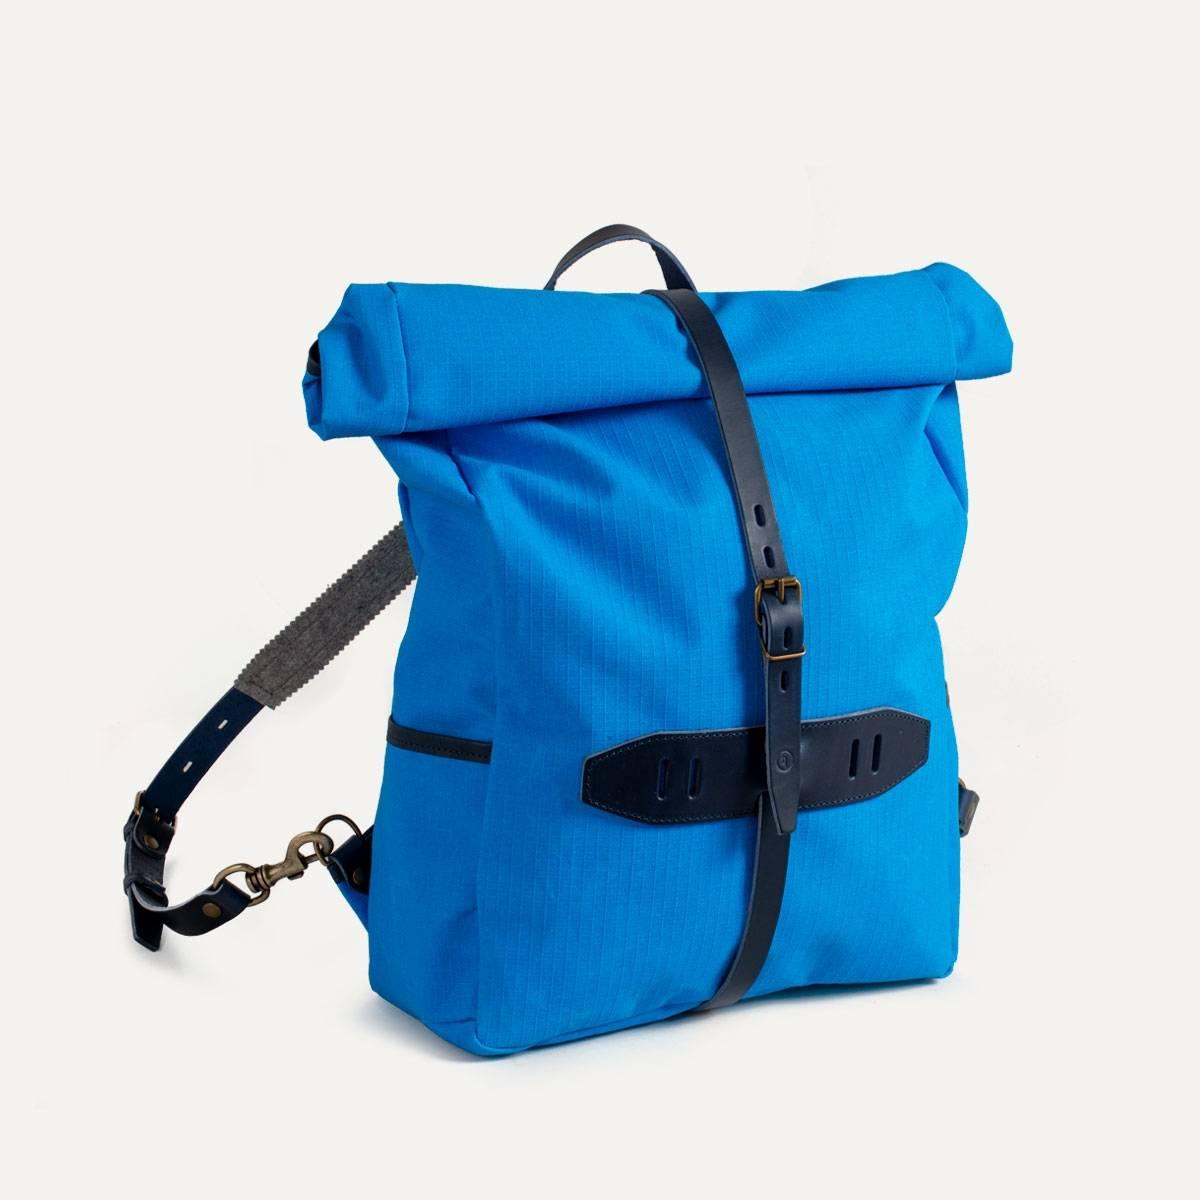 Jamy Backpack - Regentex Blue (image n°2)